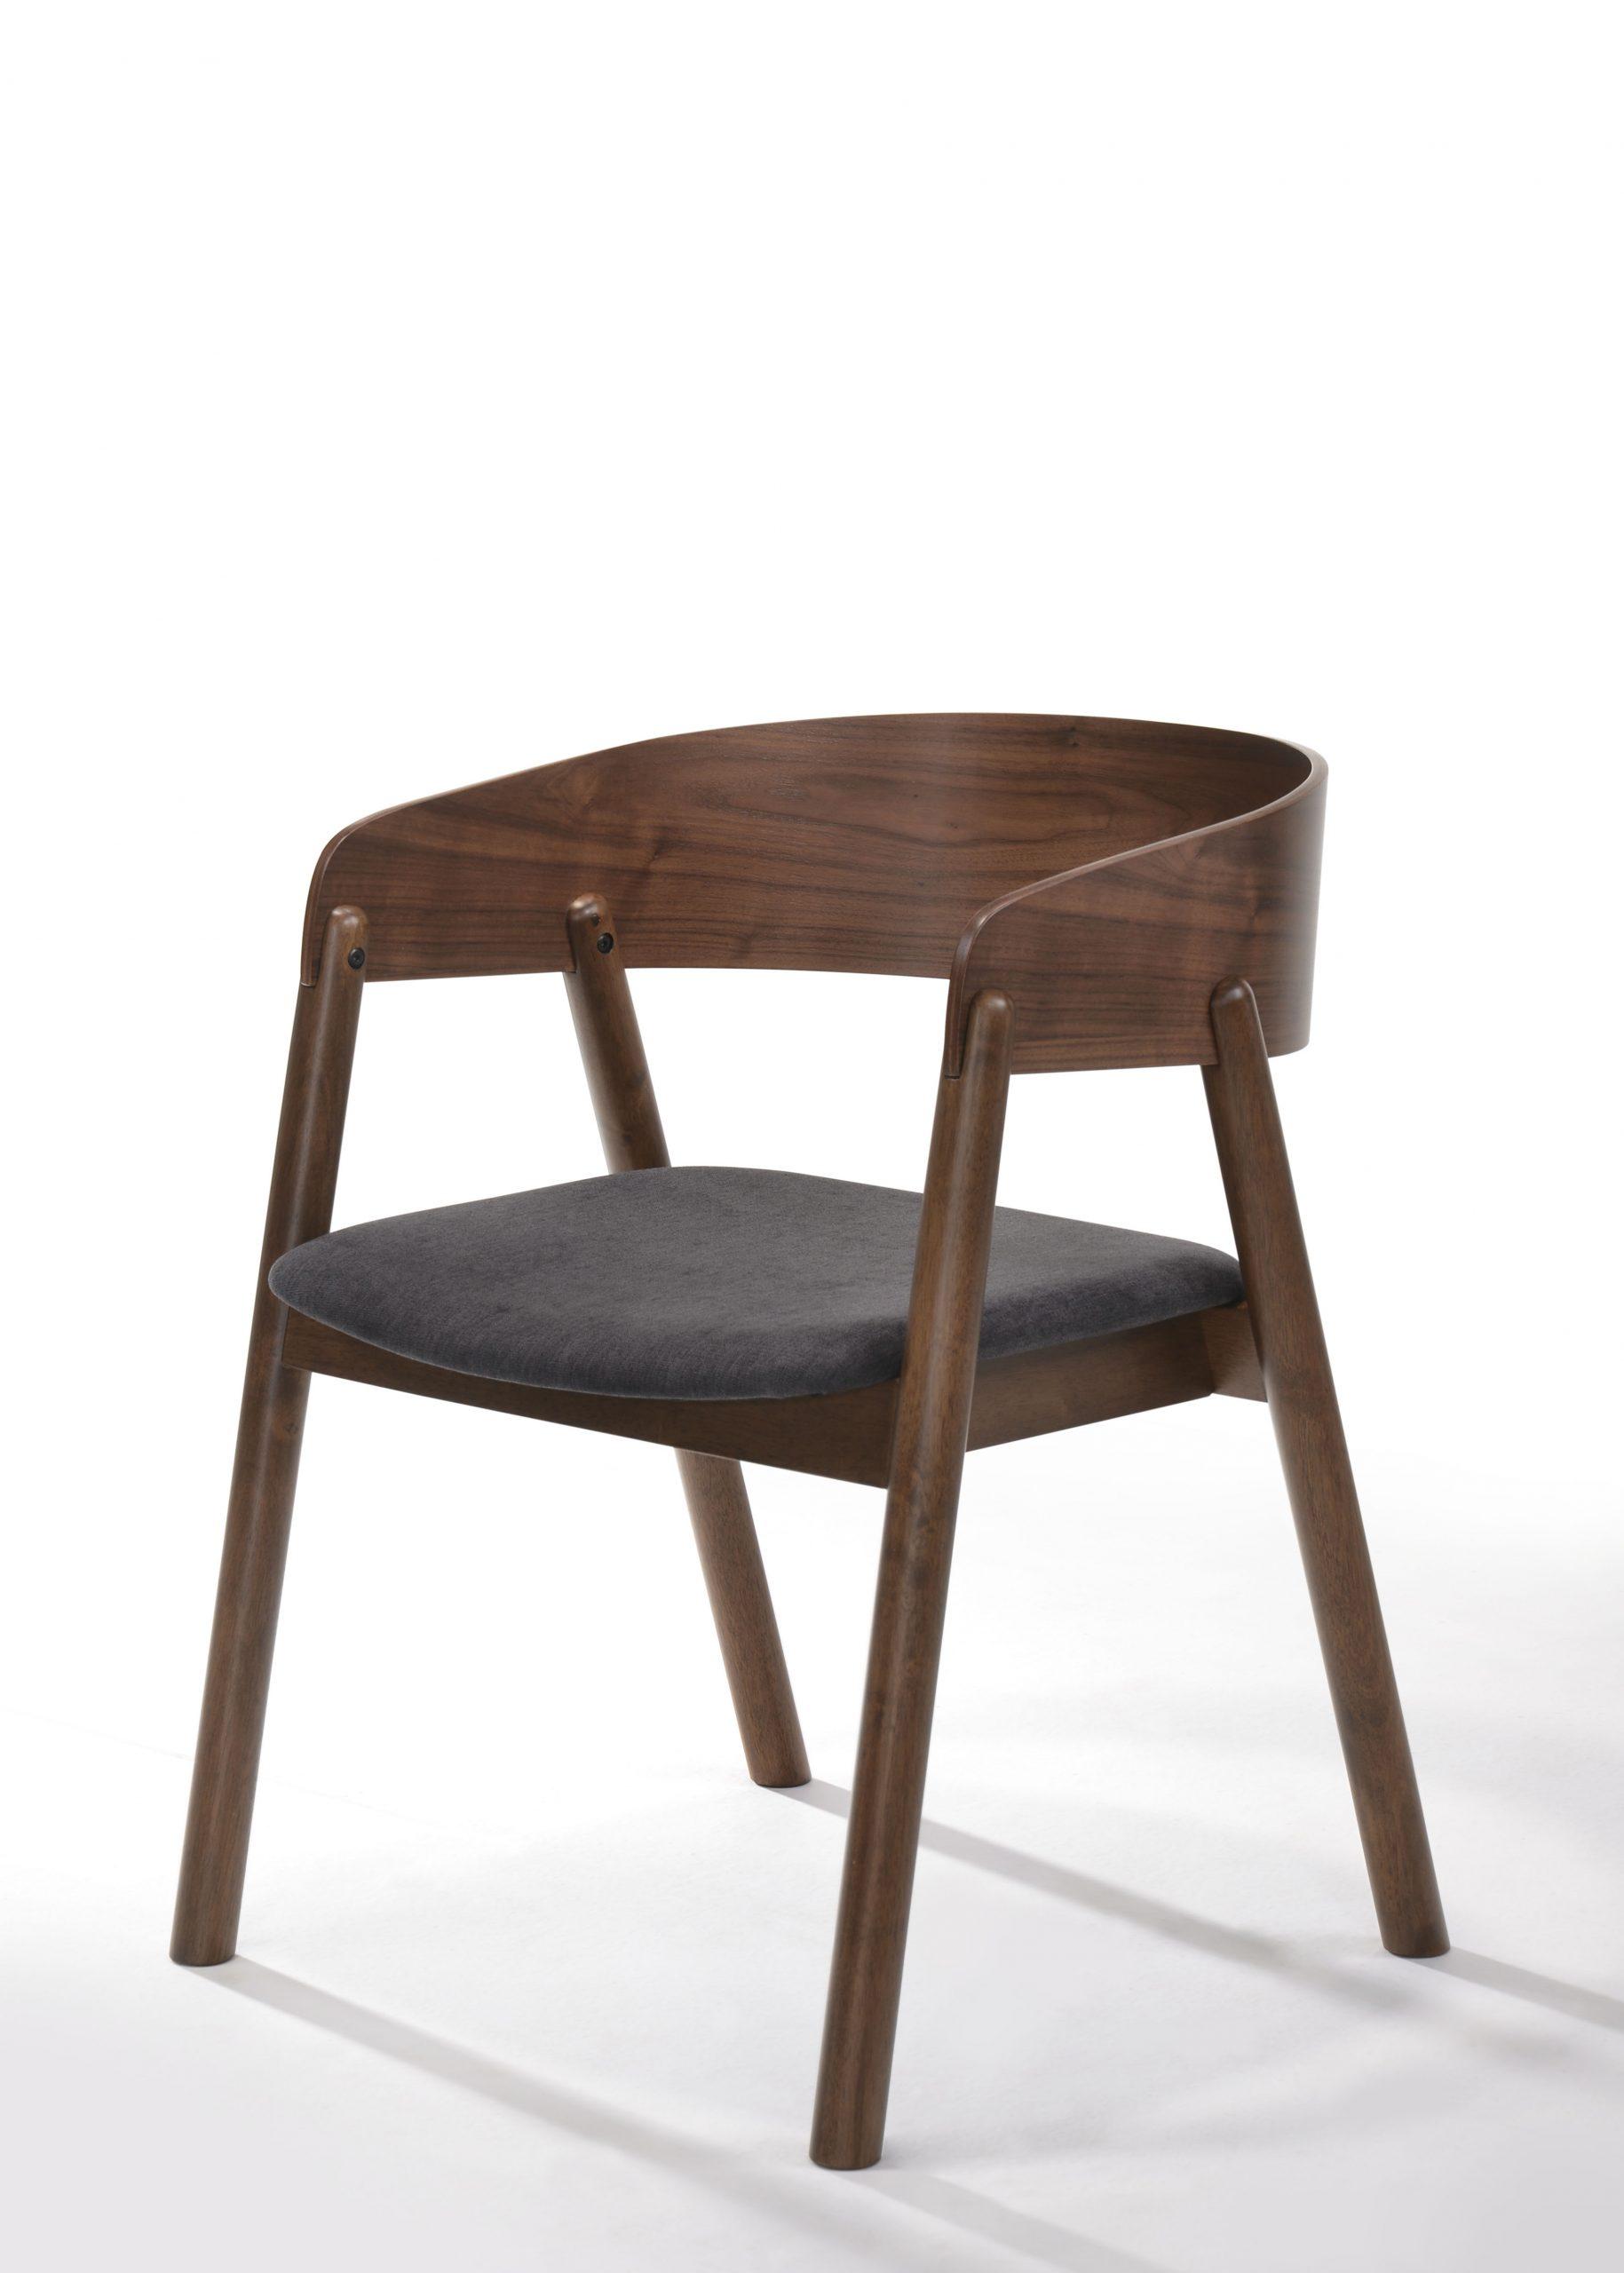 Mobiliya design - Stul -  Mİ-744  - 1